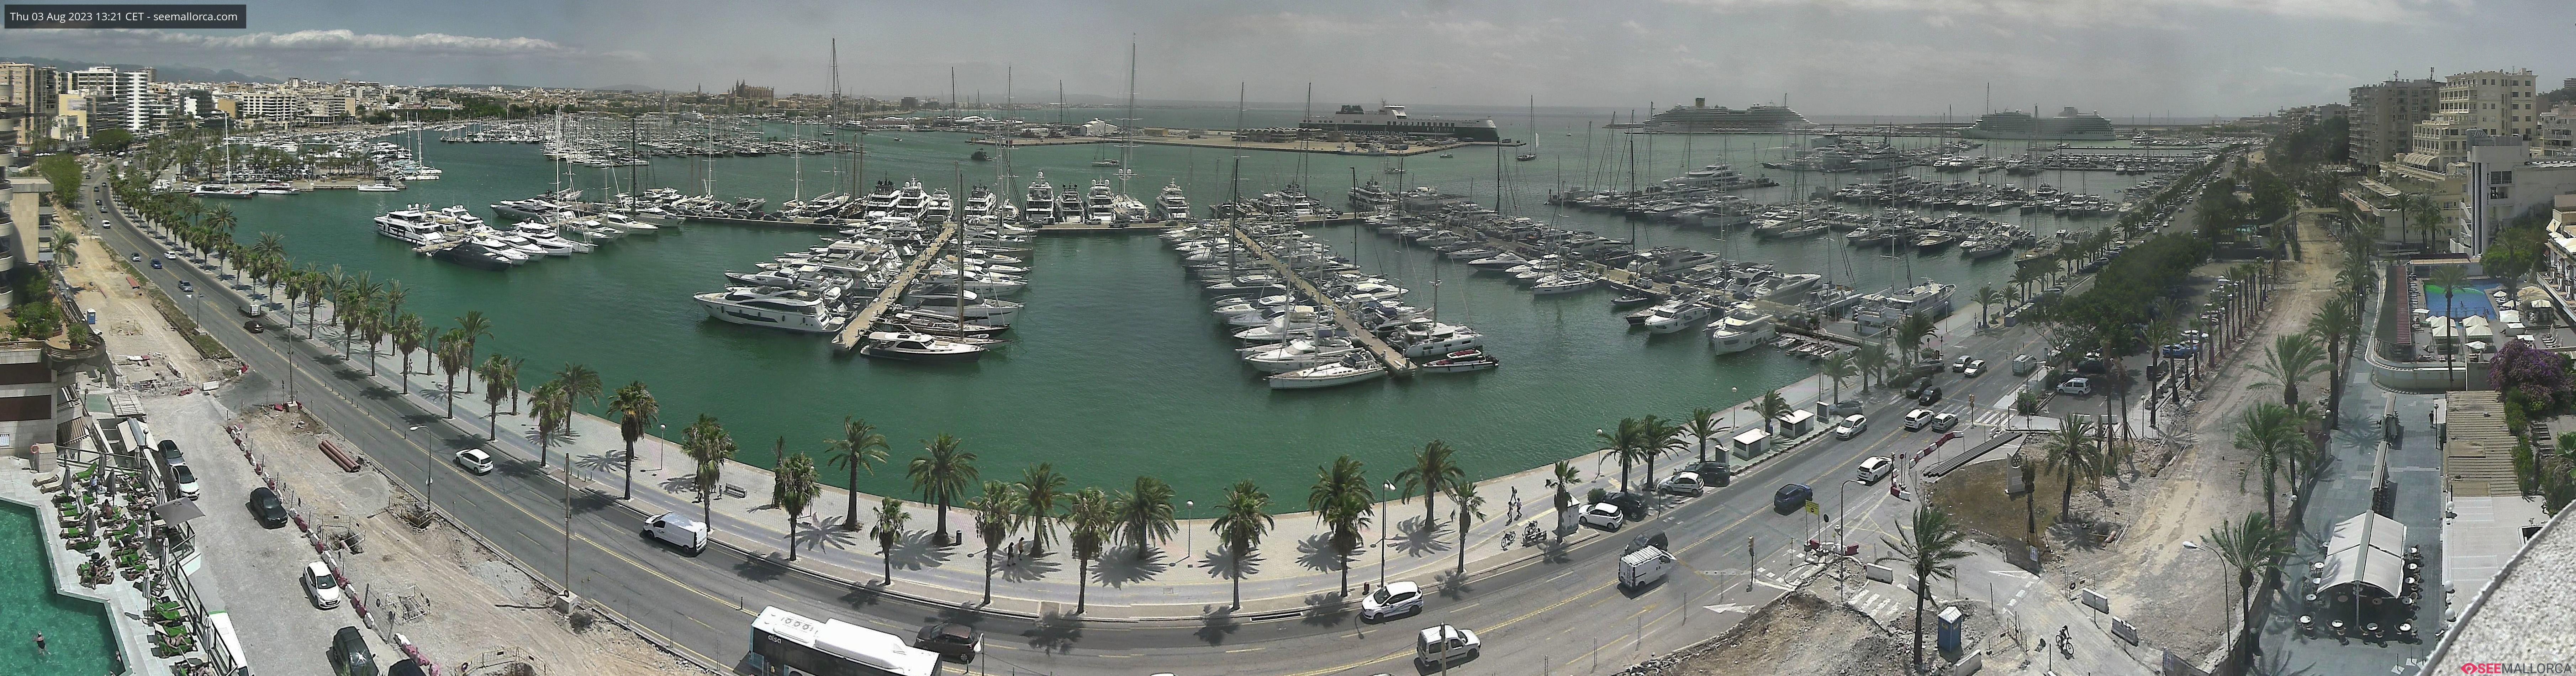 Palma de Mallorca Live Cam, Spain – Port